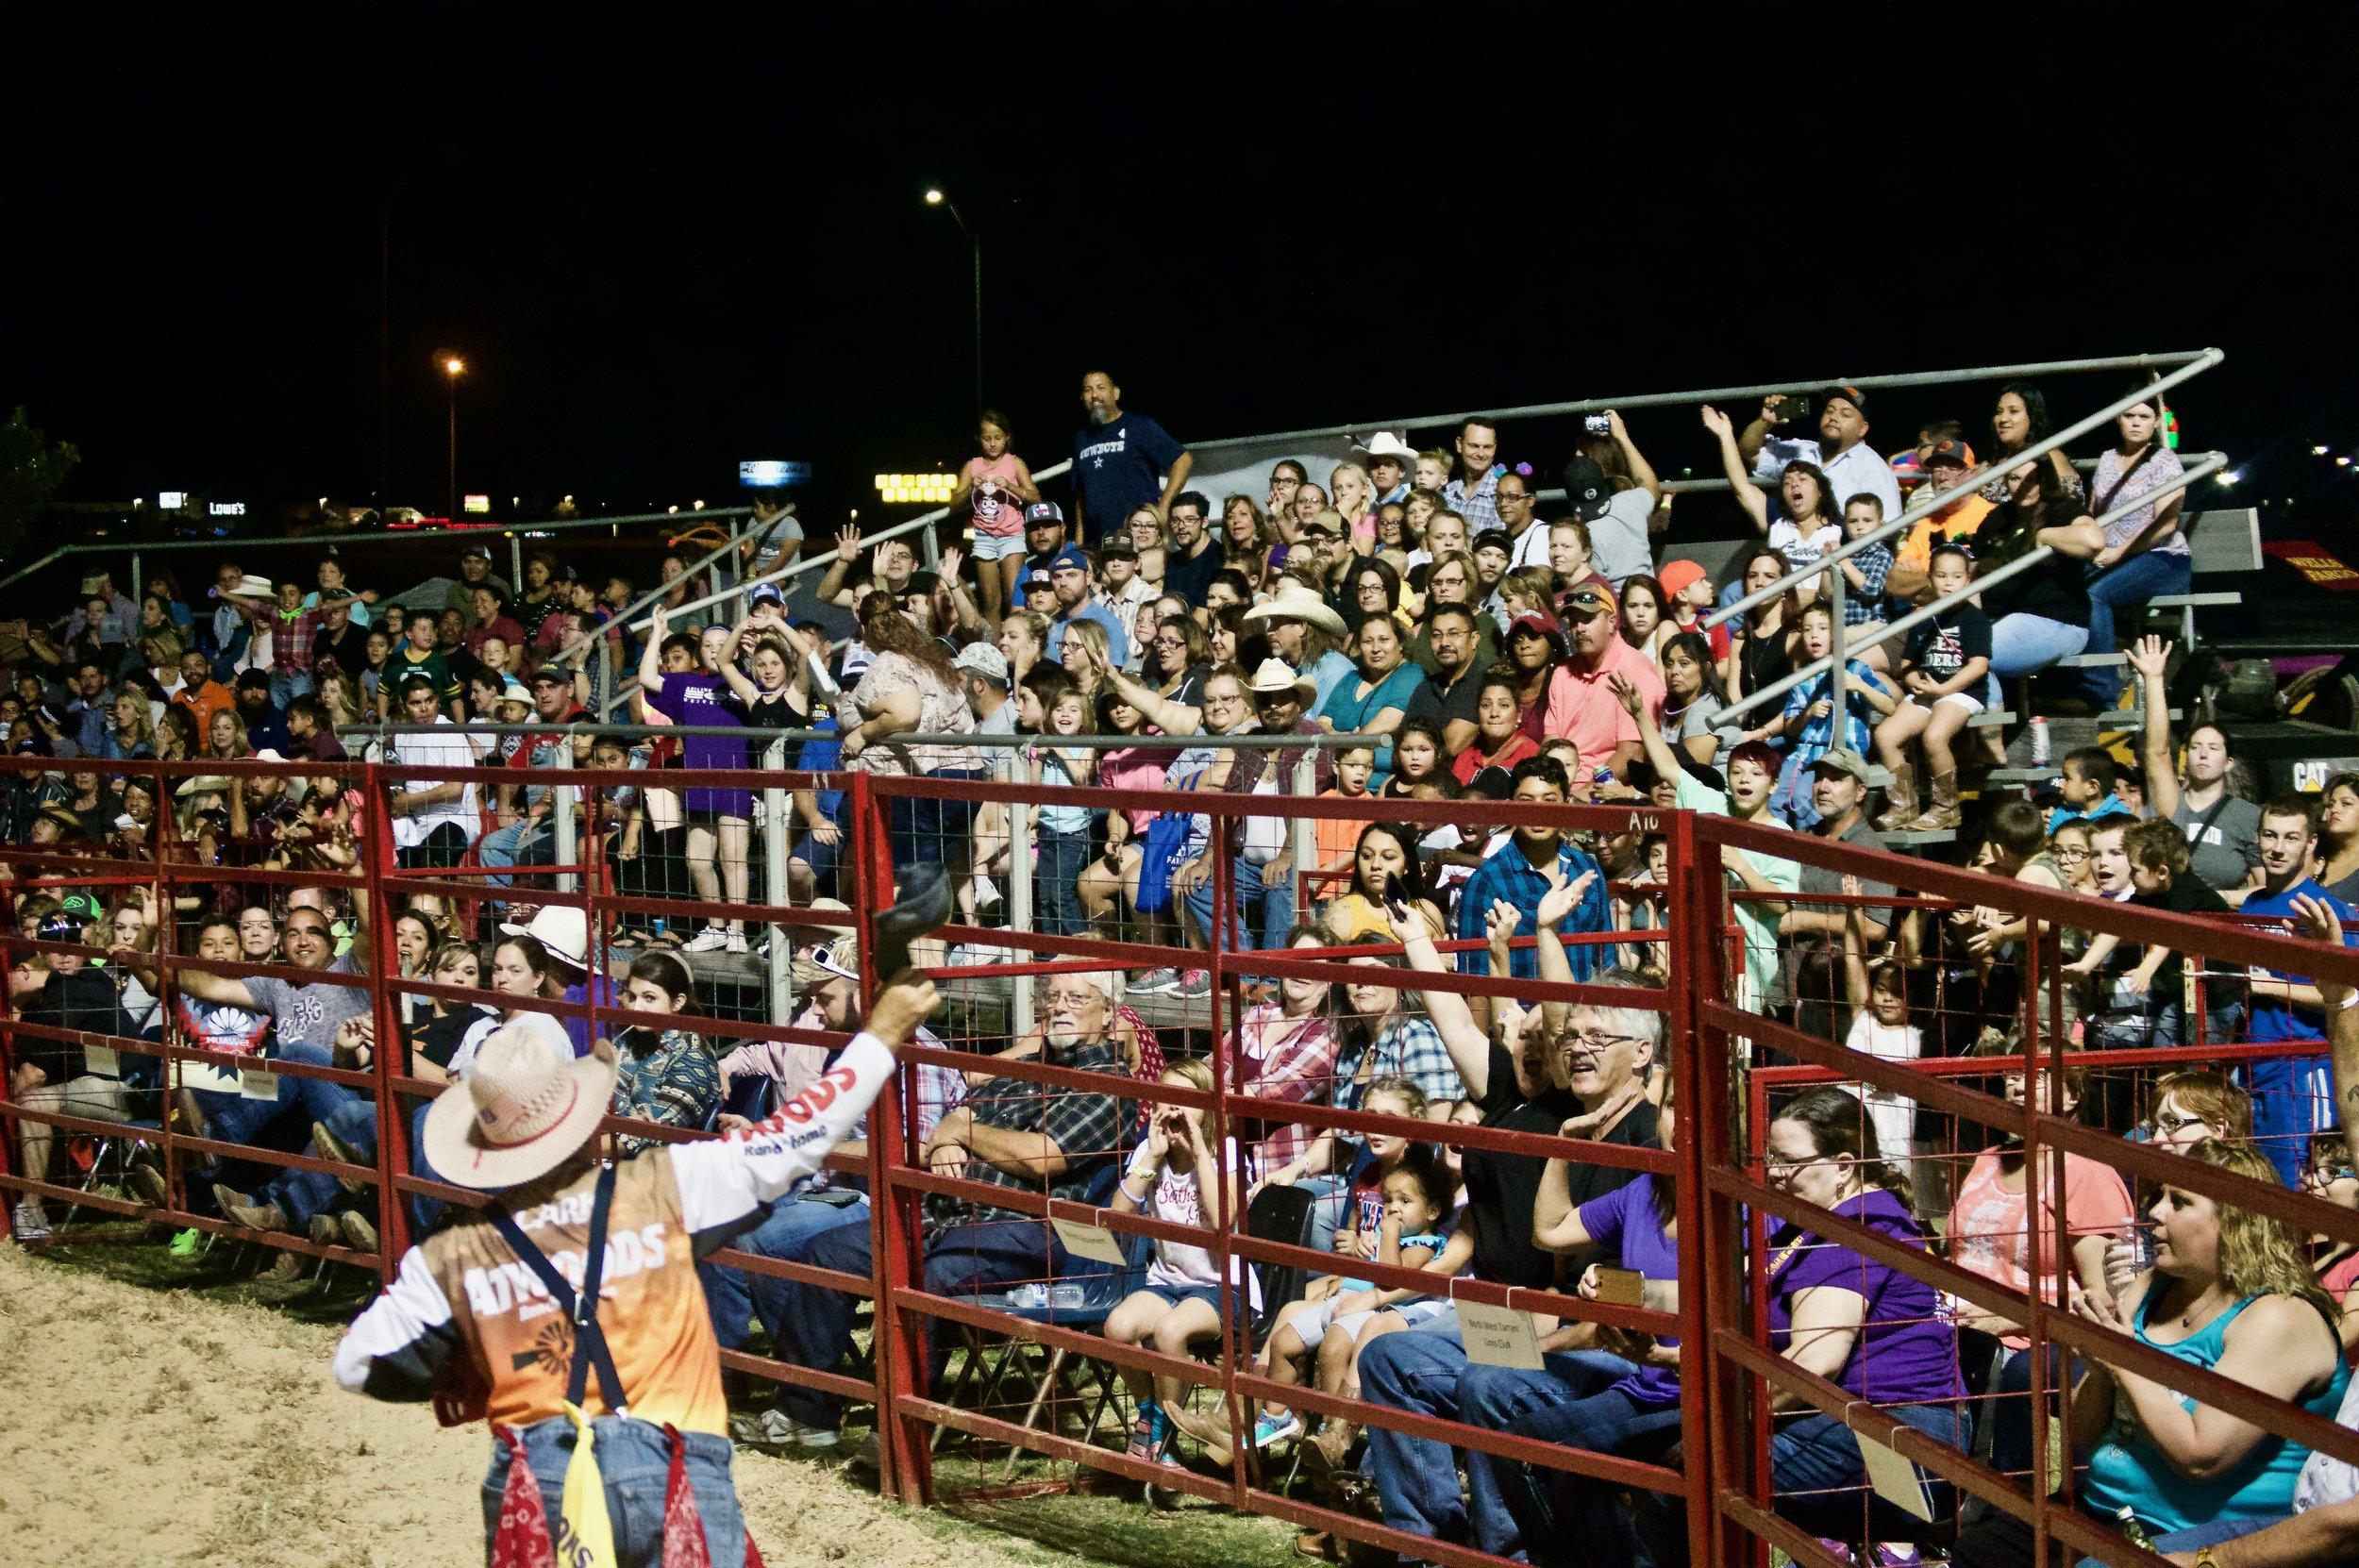 October 11-12 - Lake Worth, Texas